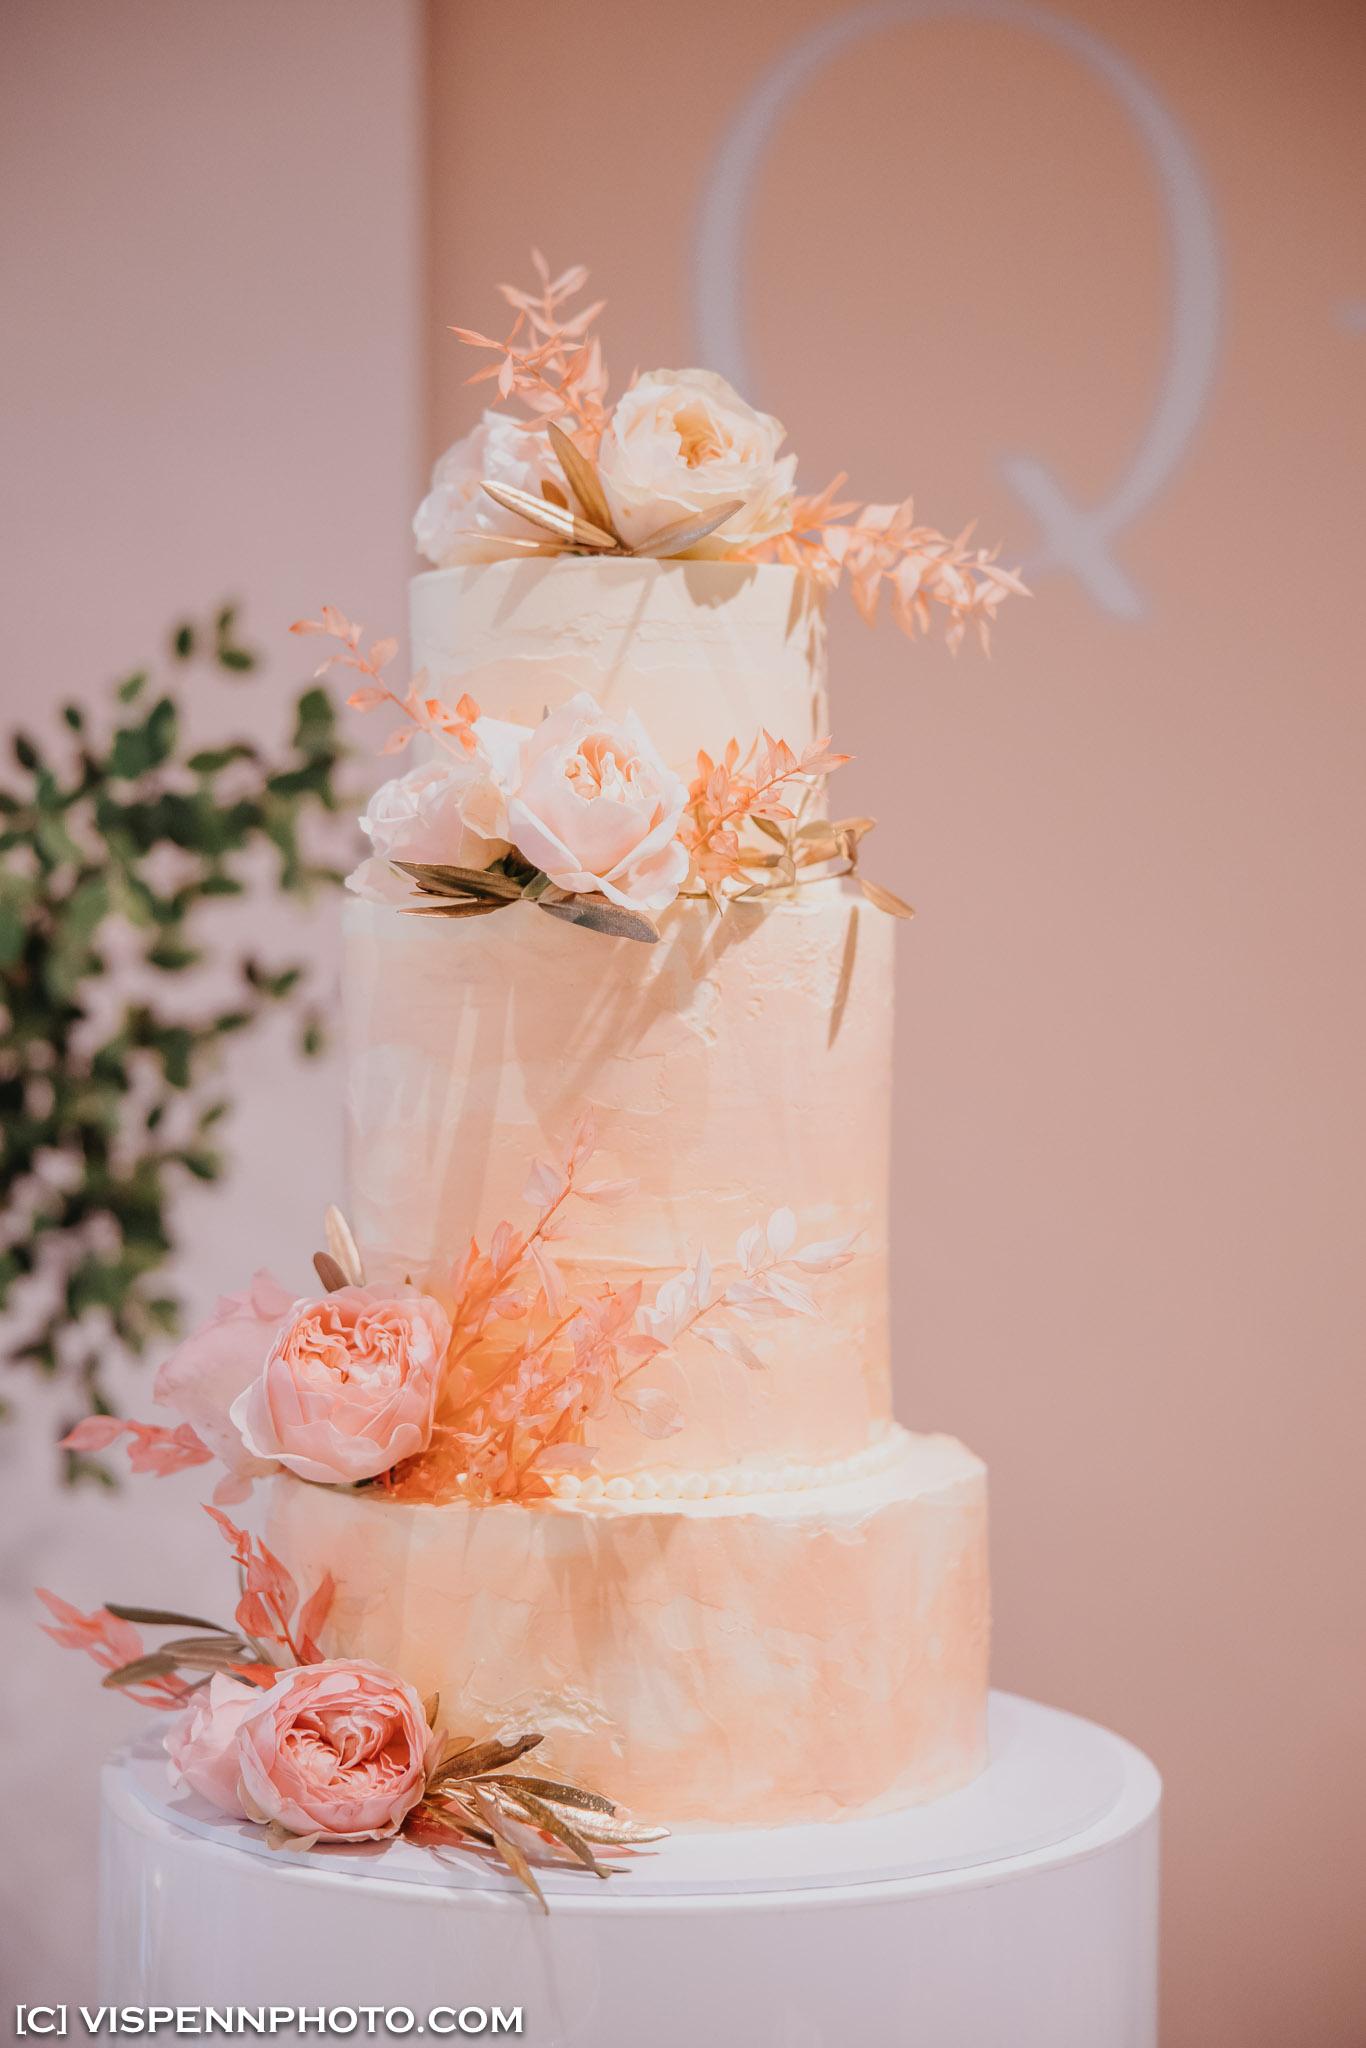 WEDDING DAY Photography Melbourne VISPENN 墨尔本 婚礼跟拍 婚礼摄像 婚礼摄影 结婚照 登记照 ElitaPB 09855 1P EOSR VISPENN